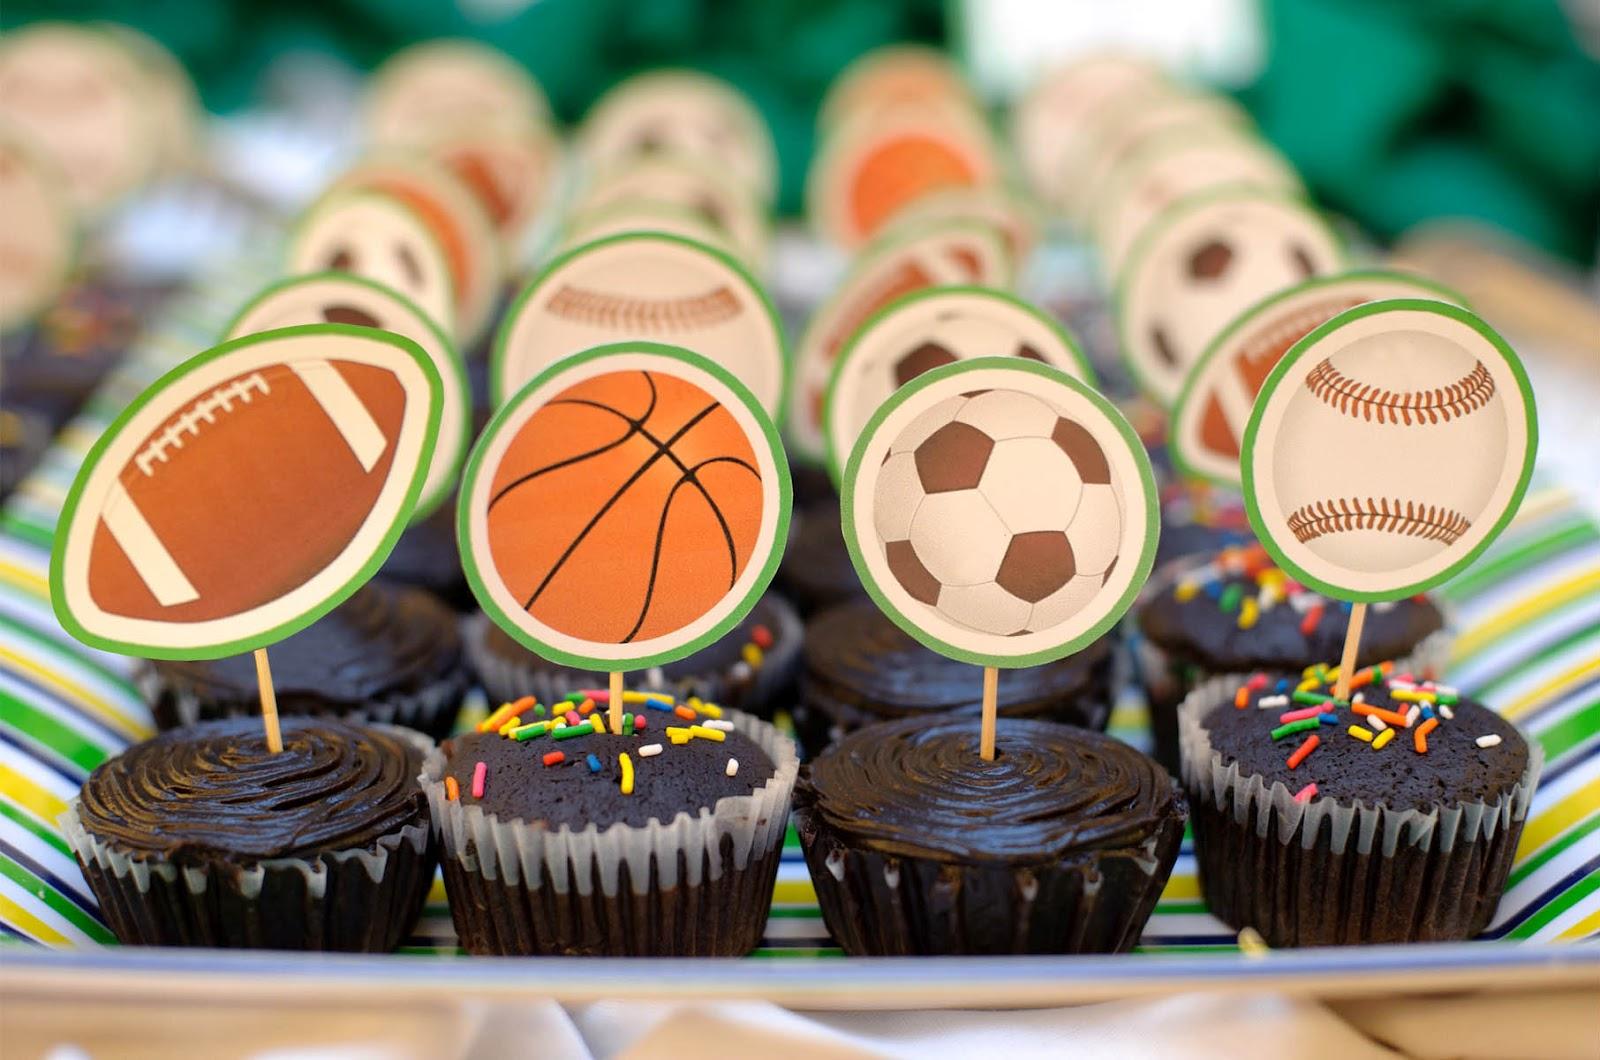 mrsmommyholic sabe s all star 1st birthday party supplier ratings